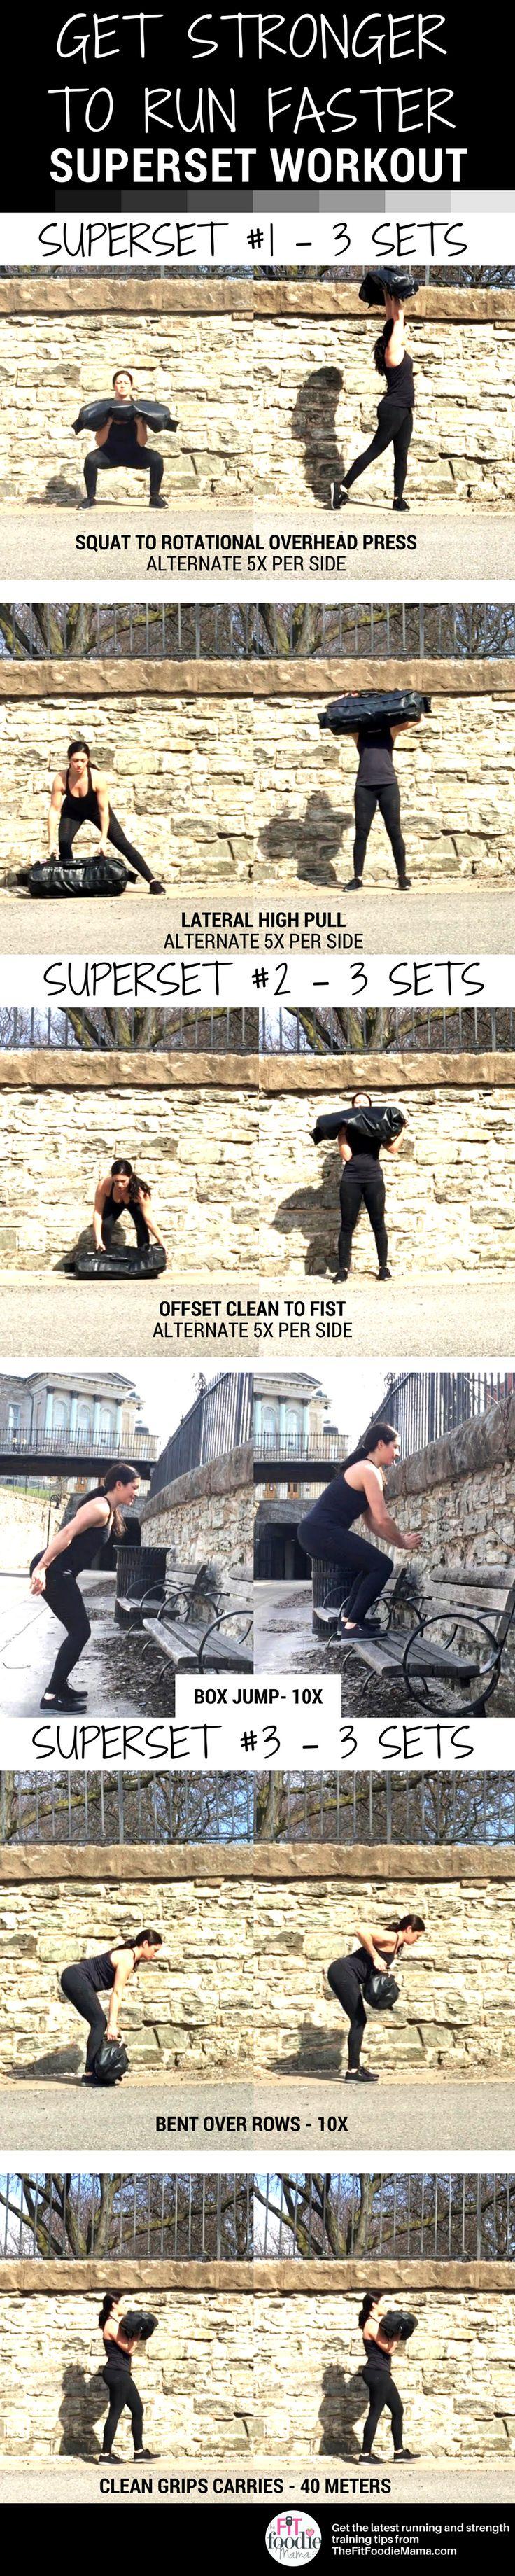 Get Stronger to Run Faster Ultimate Sandbag Workout